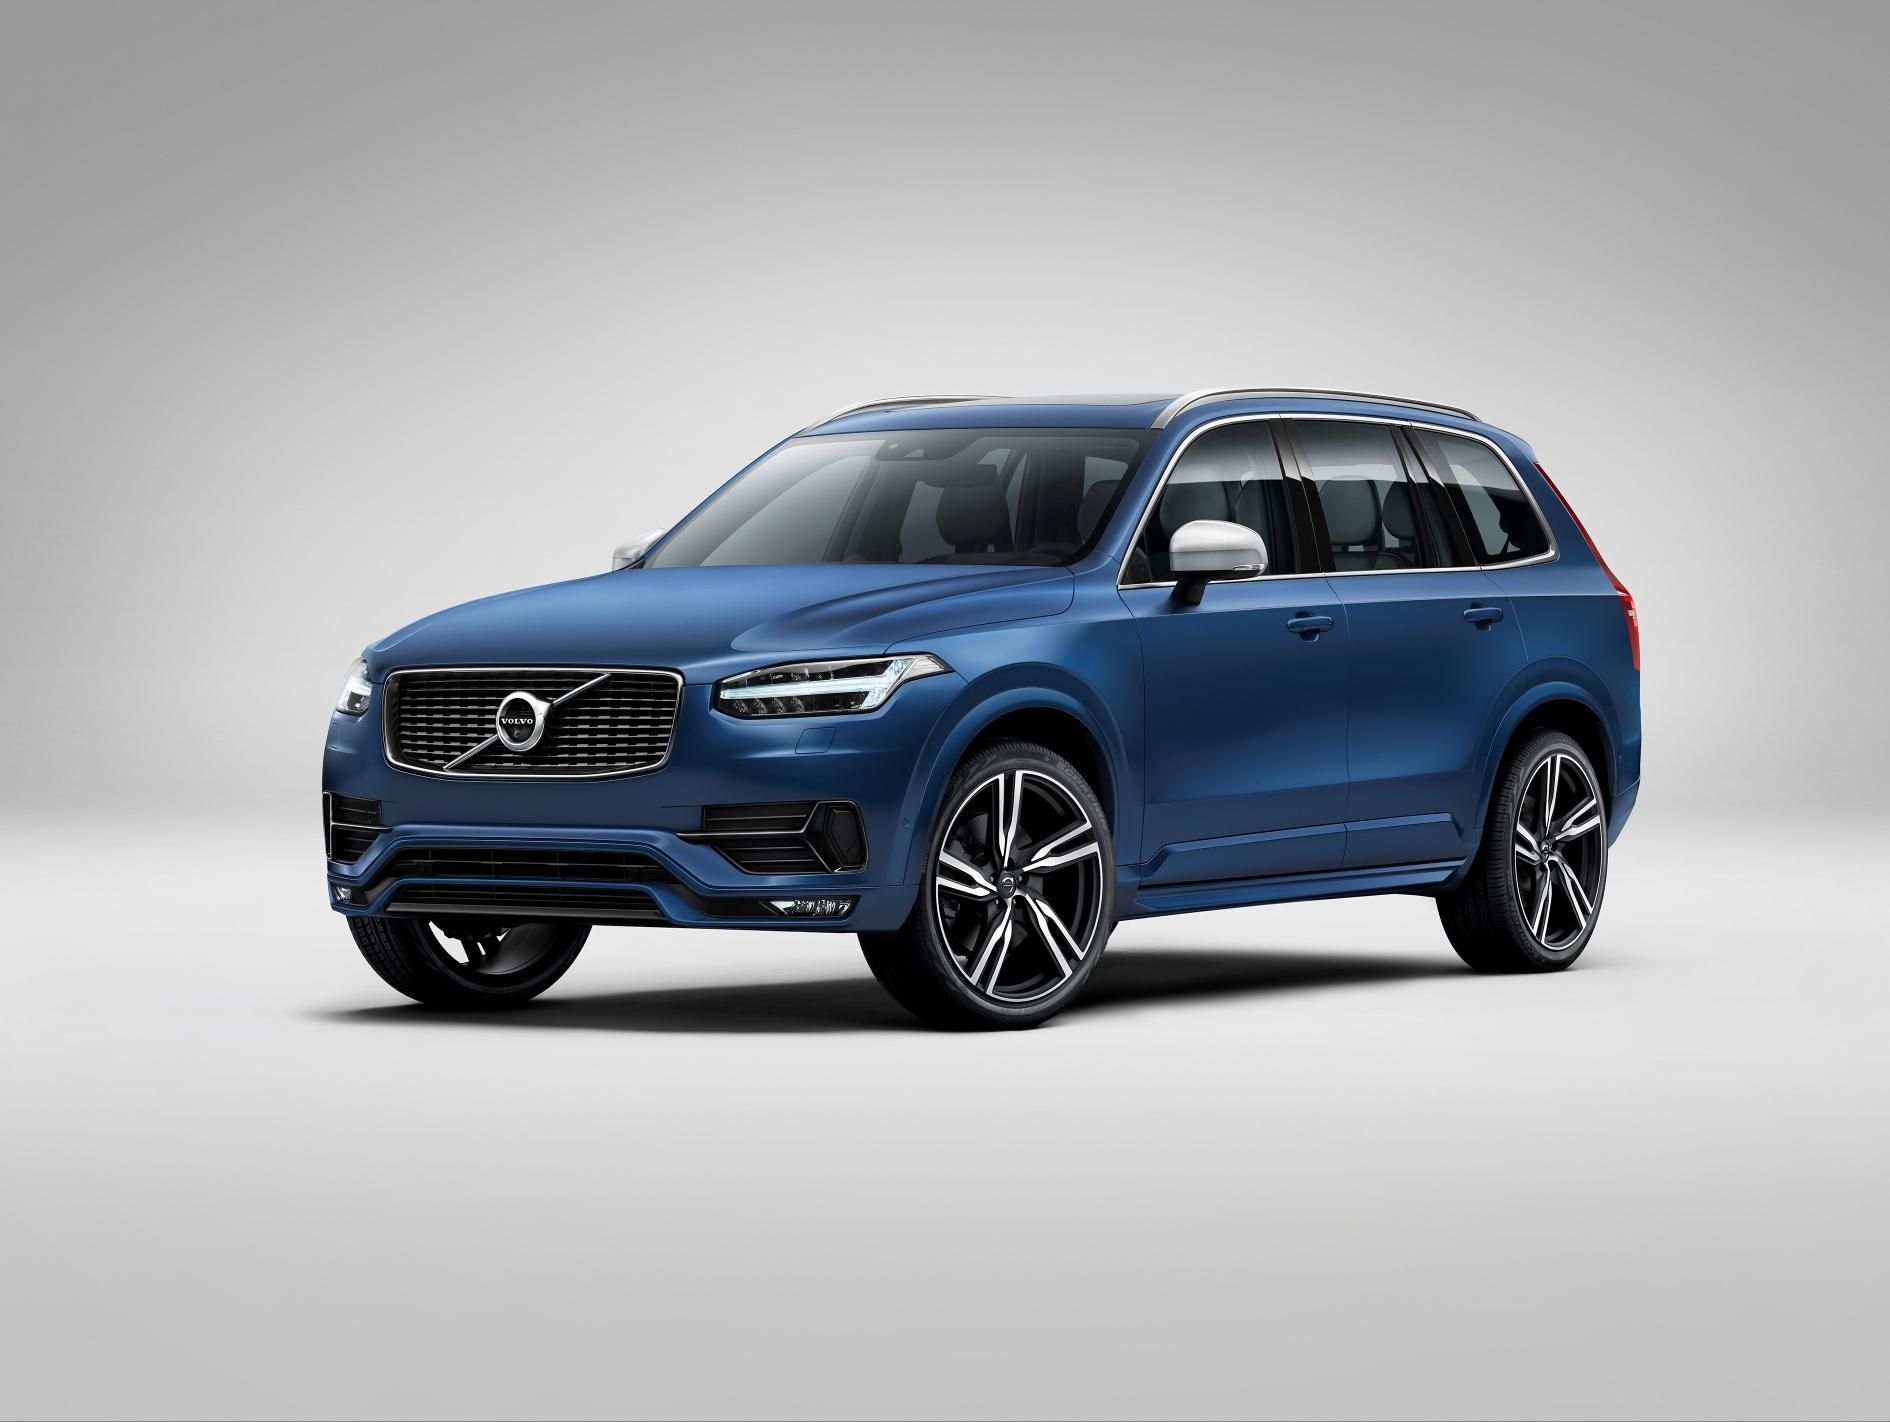 New Volvo Xc90 >> New Volvo Xc90 R Design Breaks Cover Autoevolution